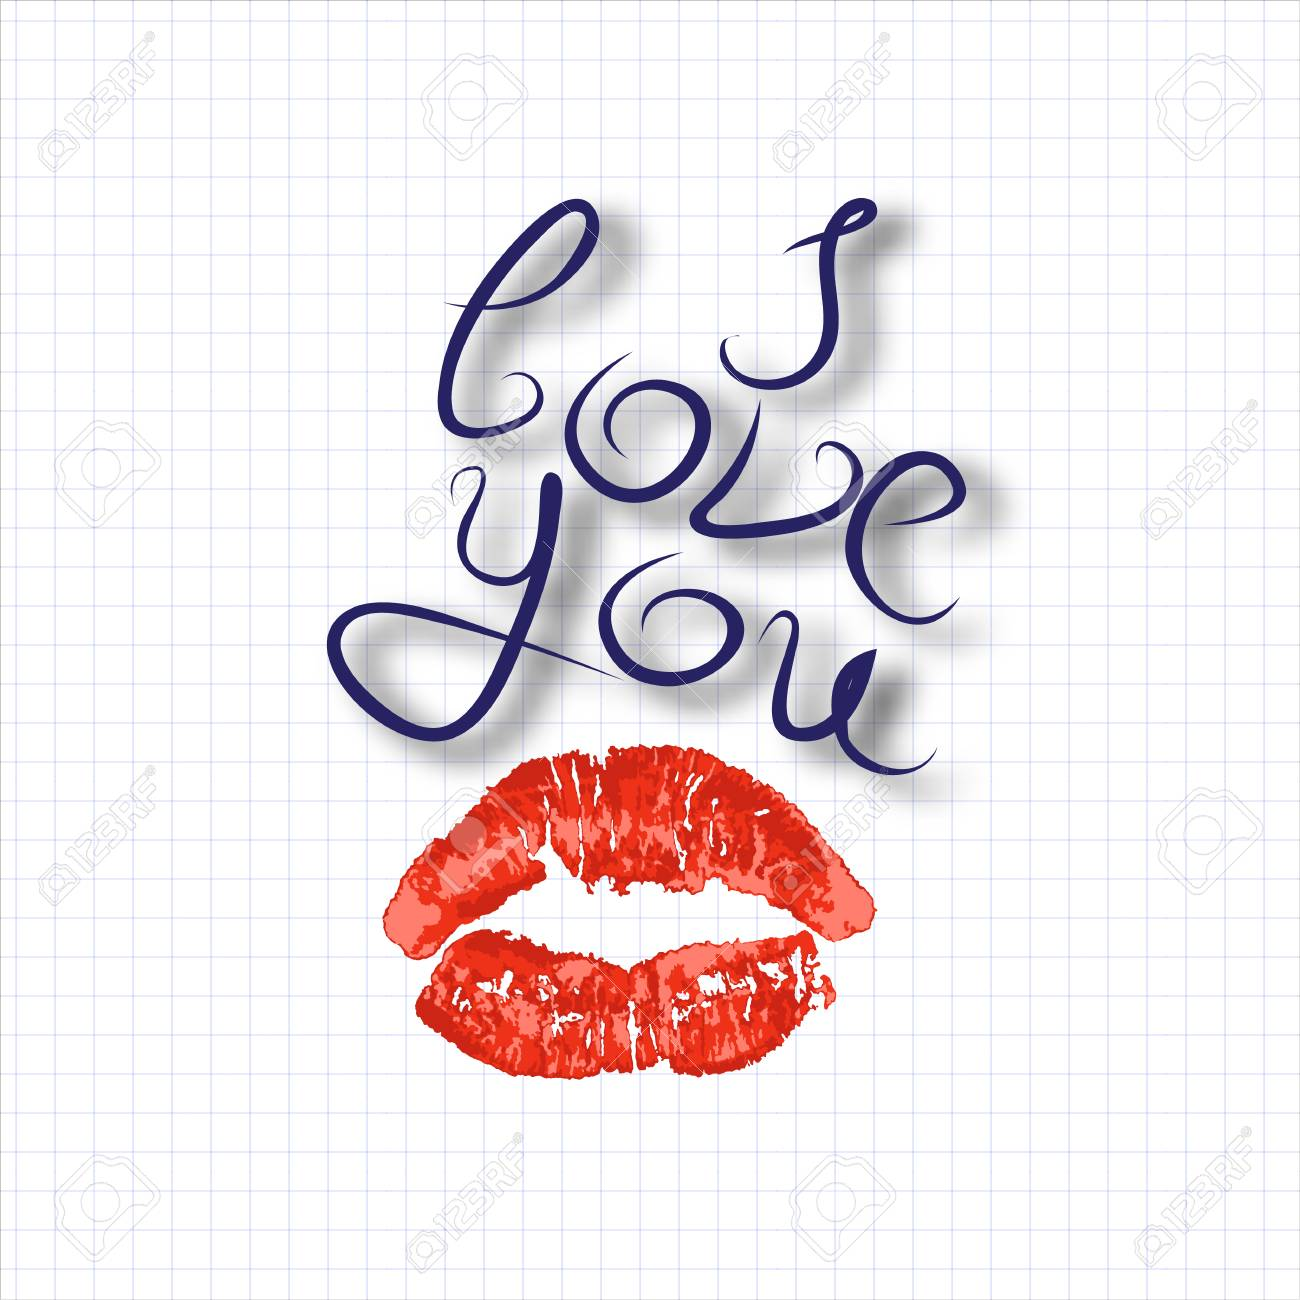 I love you, air kiss, imprint of red lipstick lips, caliber inscription, declaration of love, vector illustration - 94471814